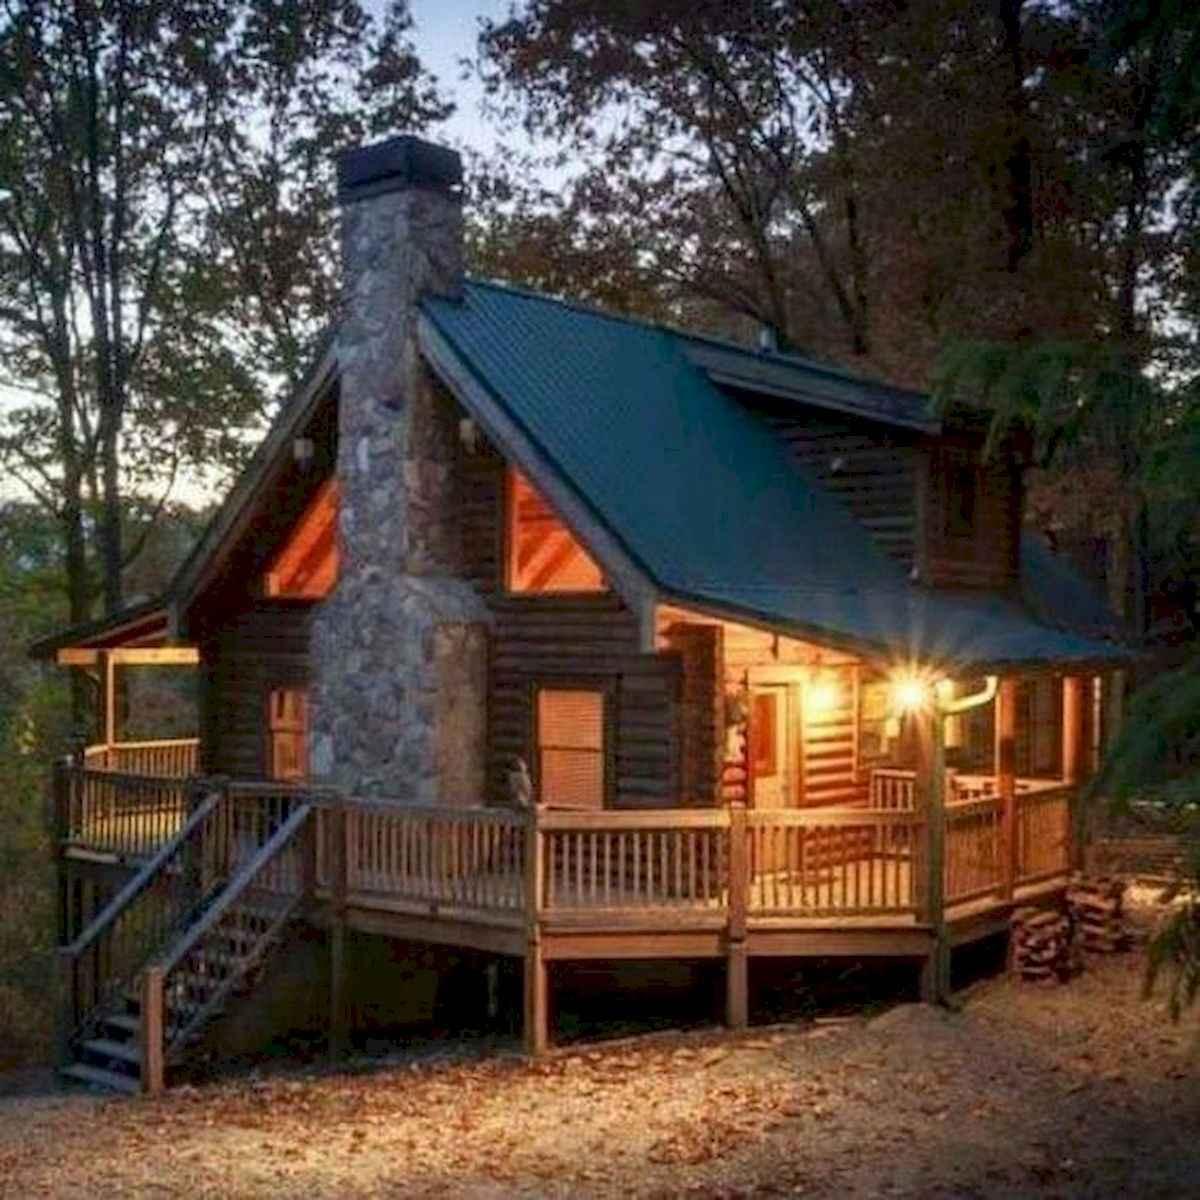 70 Suprising Small Log Cabin Homes Design Ideas (8)